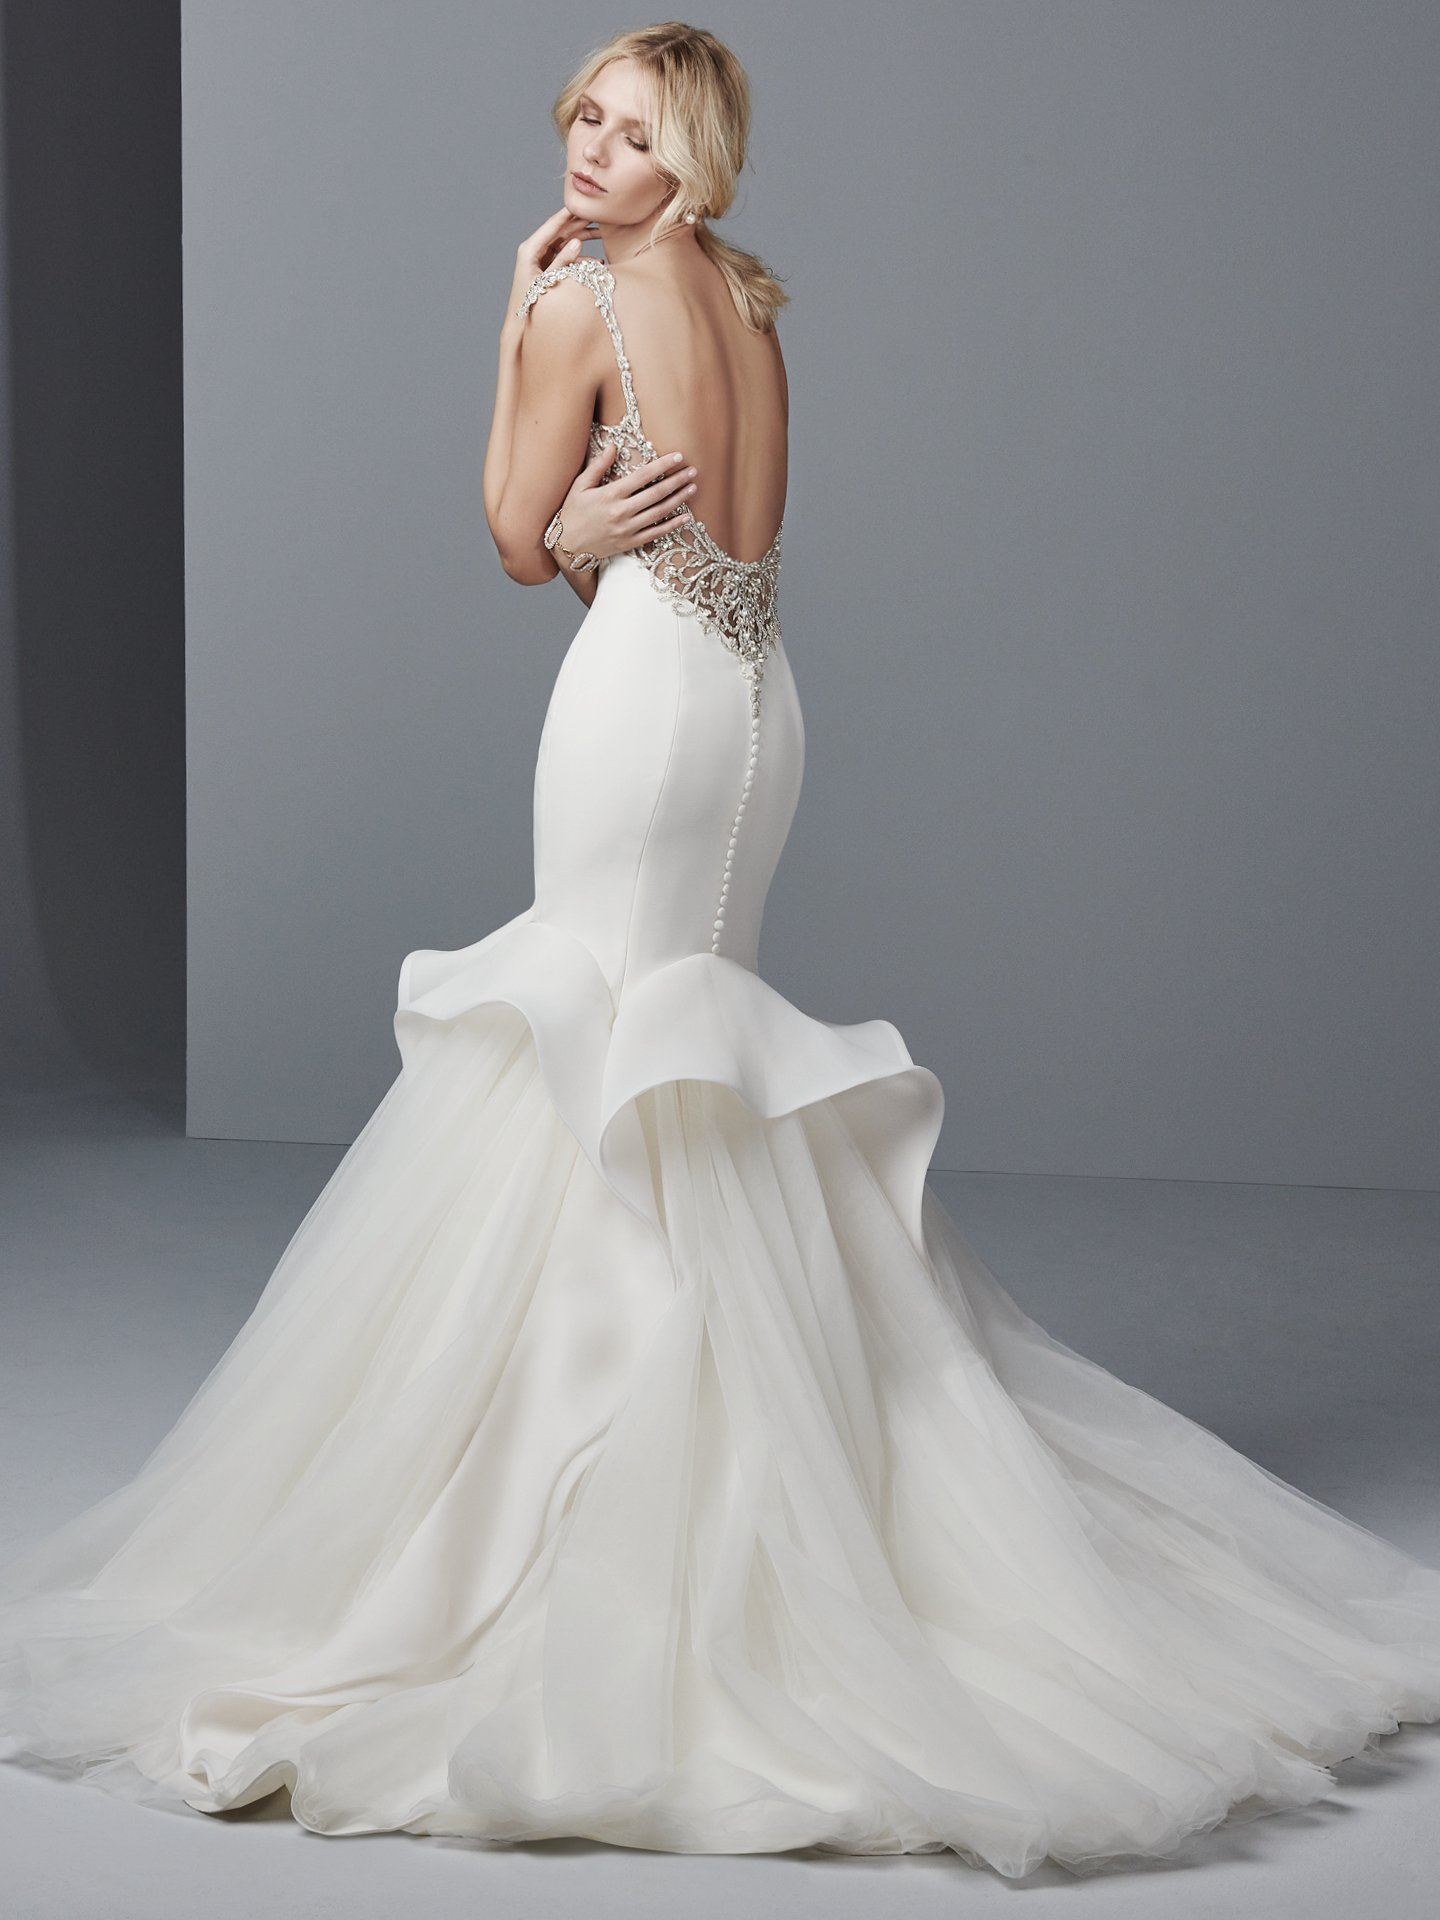 Organza wedding dress Raquelle by Sottero and Midgley